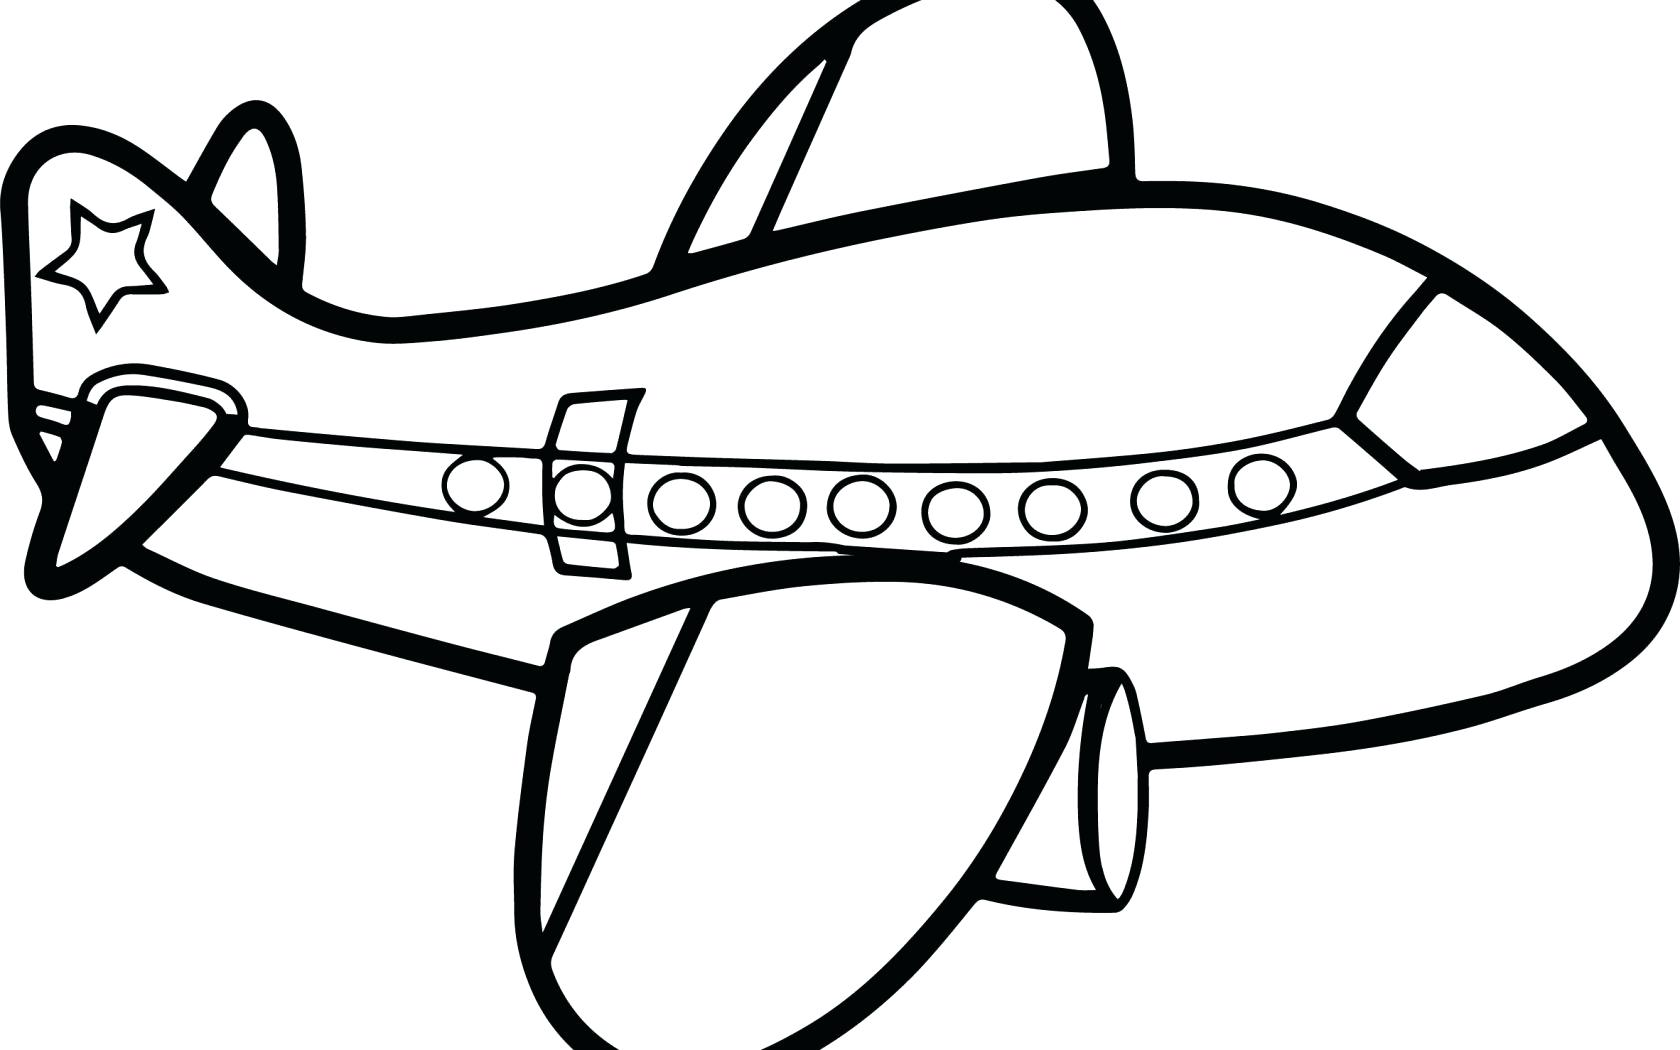 Aeroplane Drawing For Kids At Getdrawings